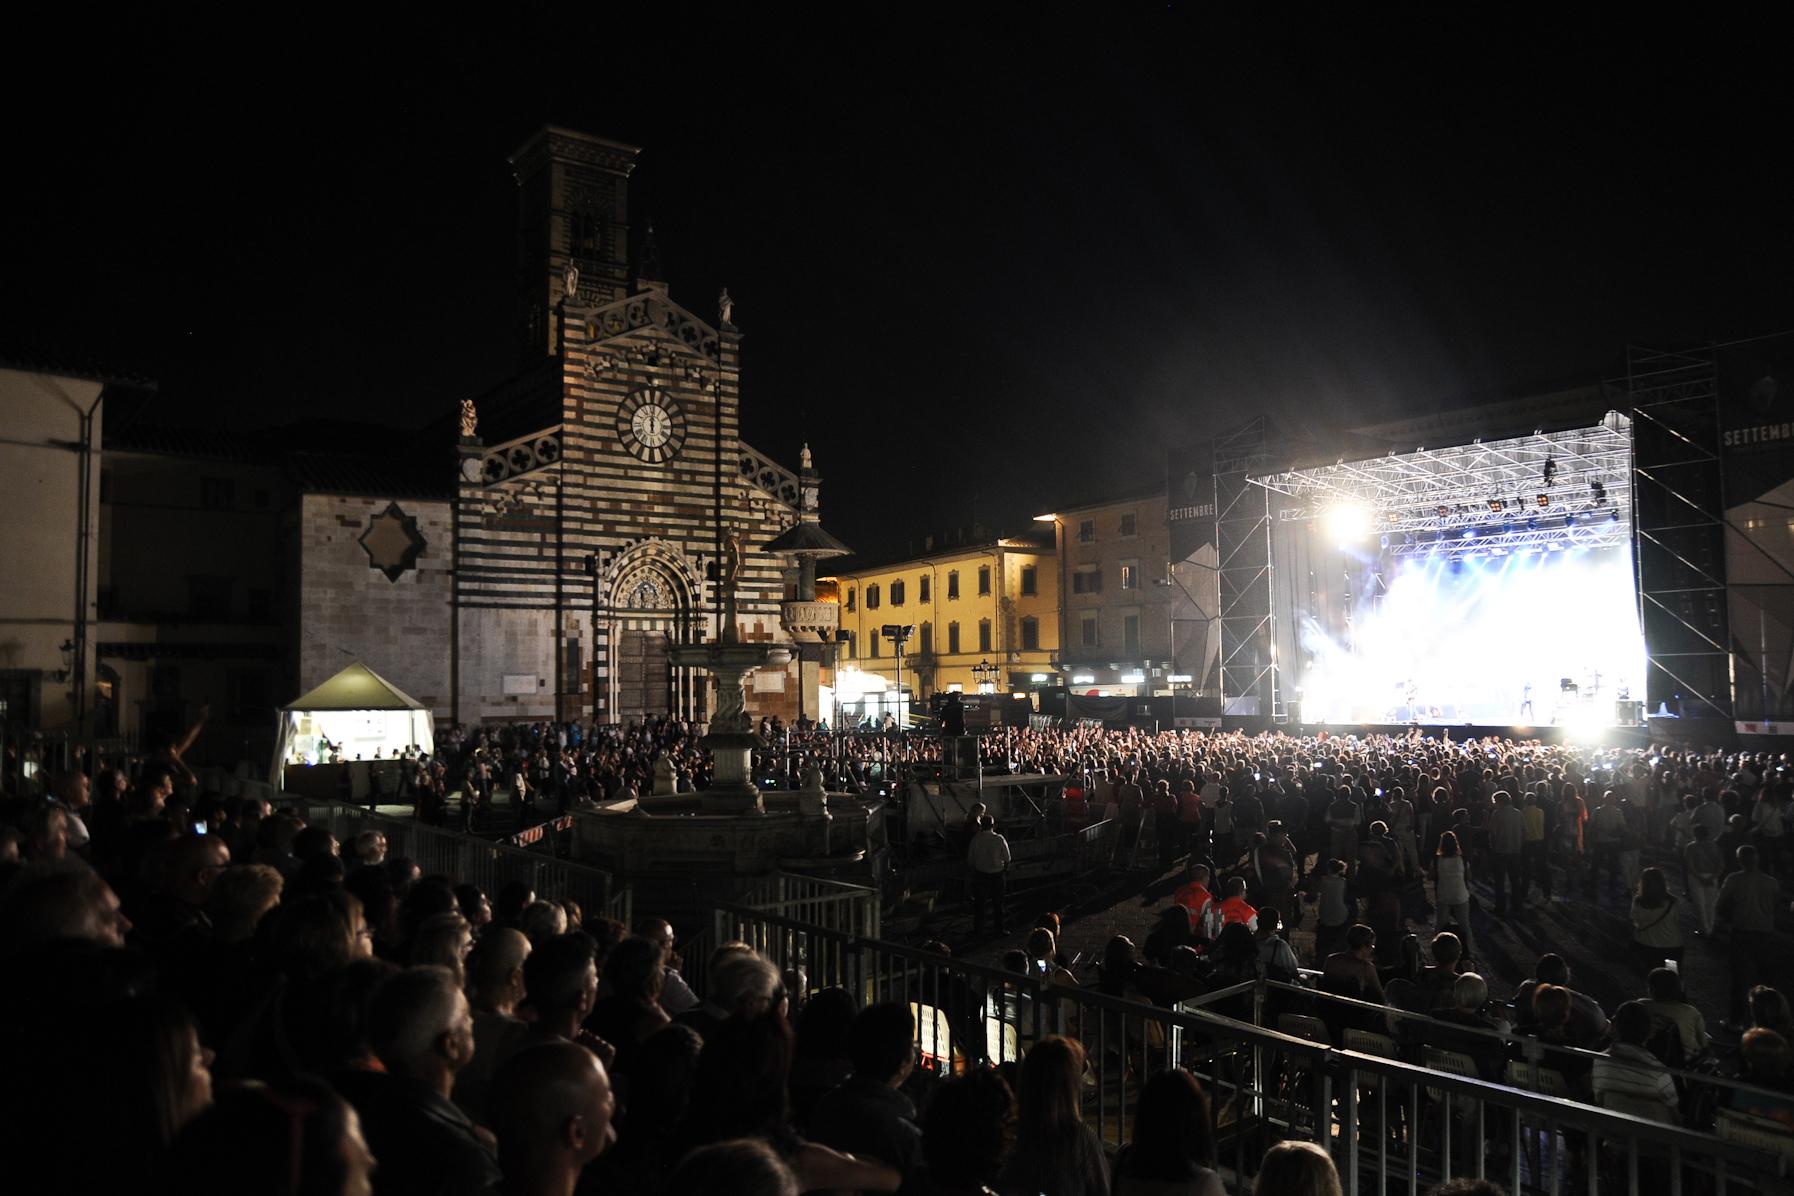 Pubblico a un concerto in piazza Duomo